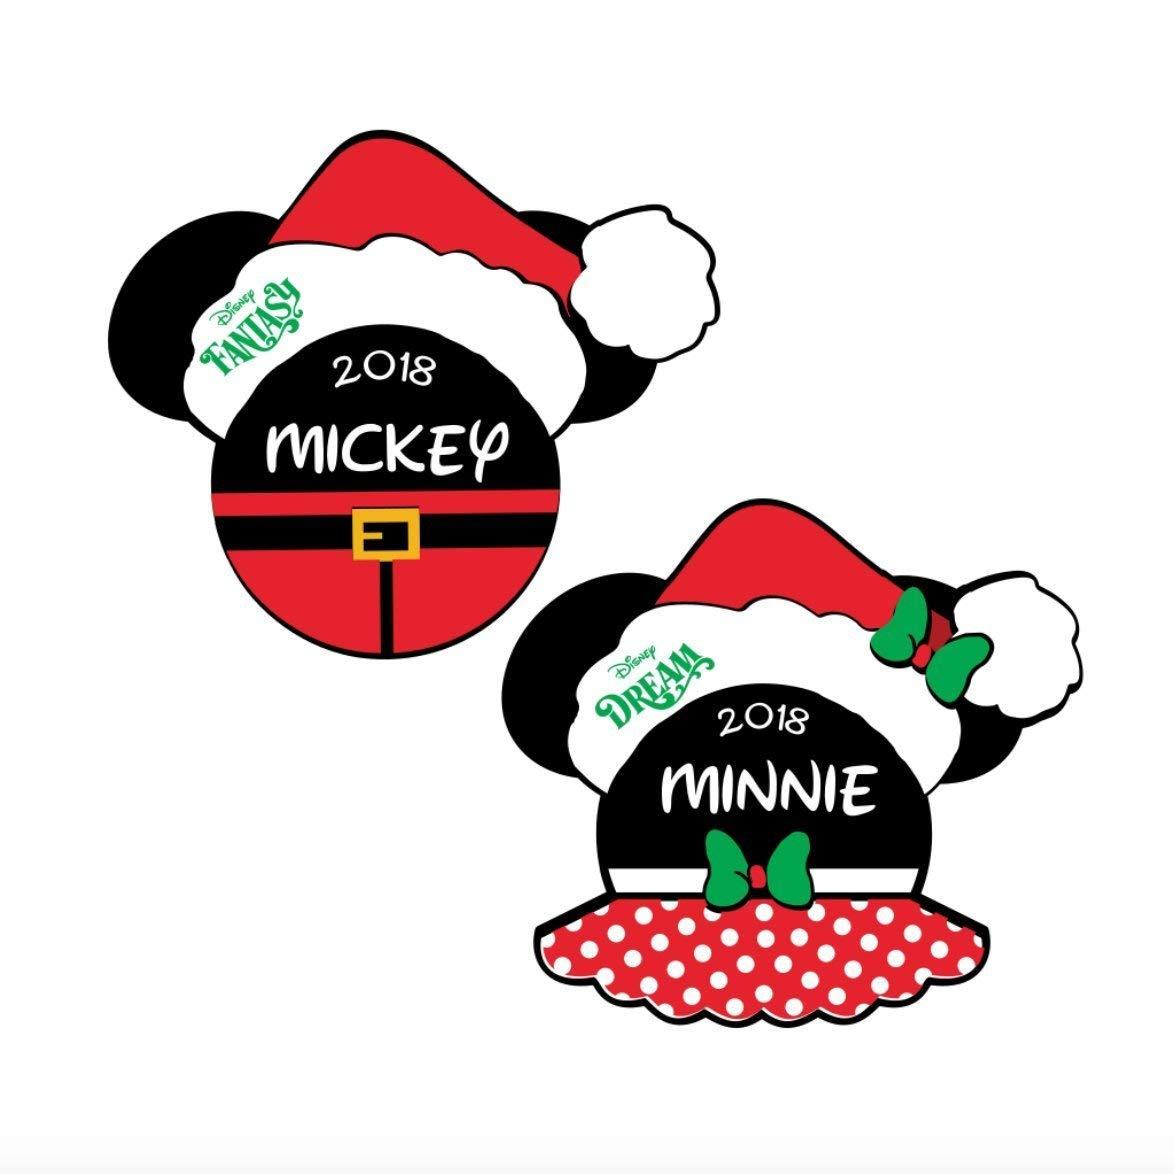 Christmas Clipart Santa.Disney Cruise Christmas Magnet Santa Mickey Minnie Magnets For Disney Cruise Disney Cruise Christmas Door Magnet Disney Cruise Magnets